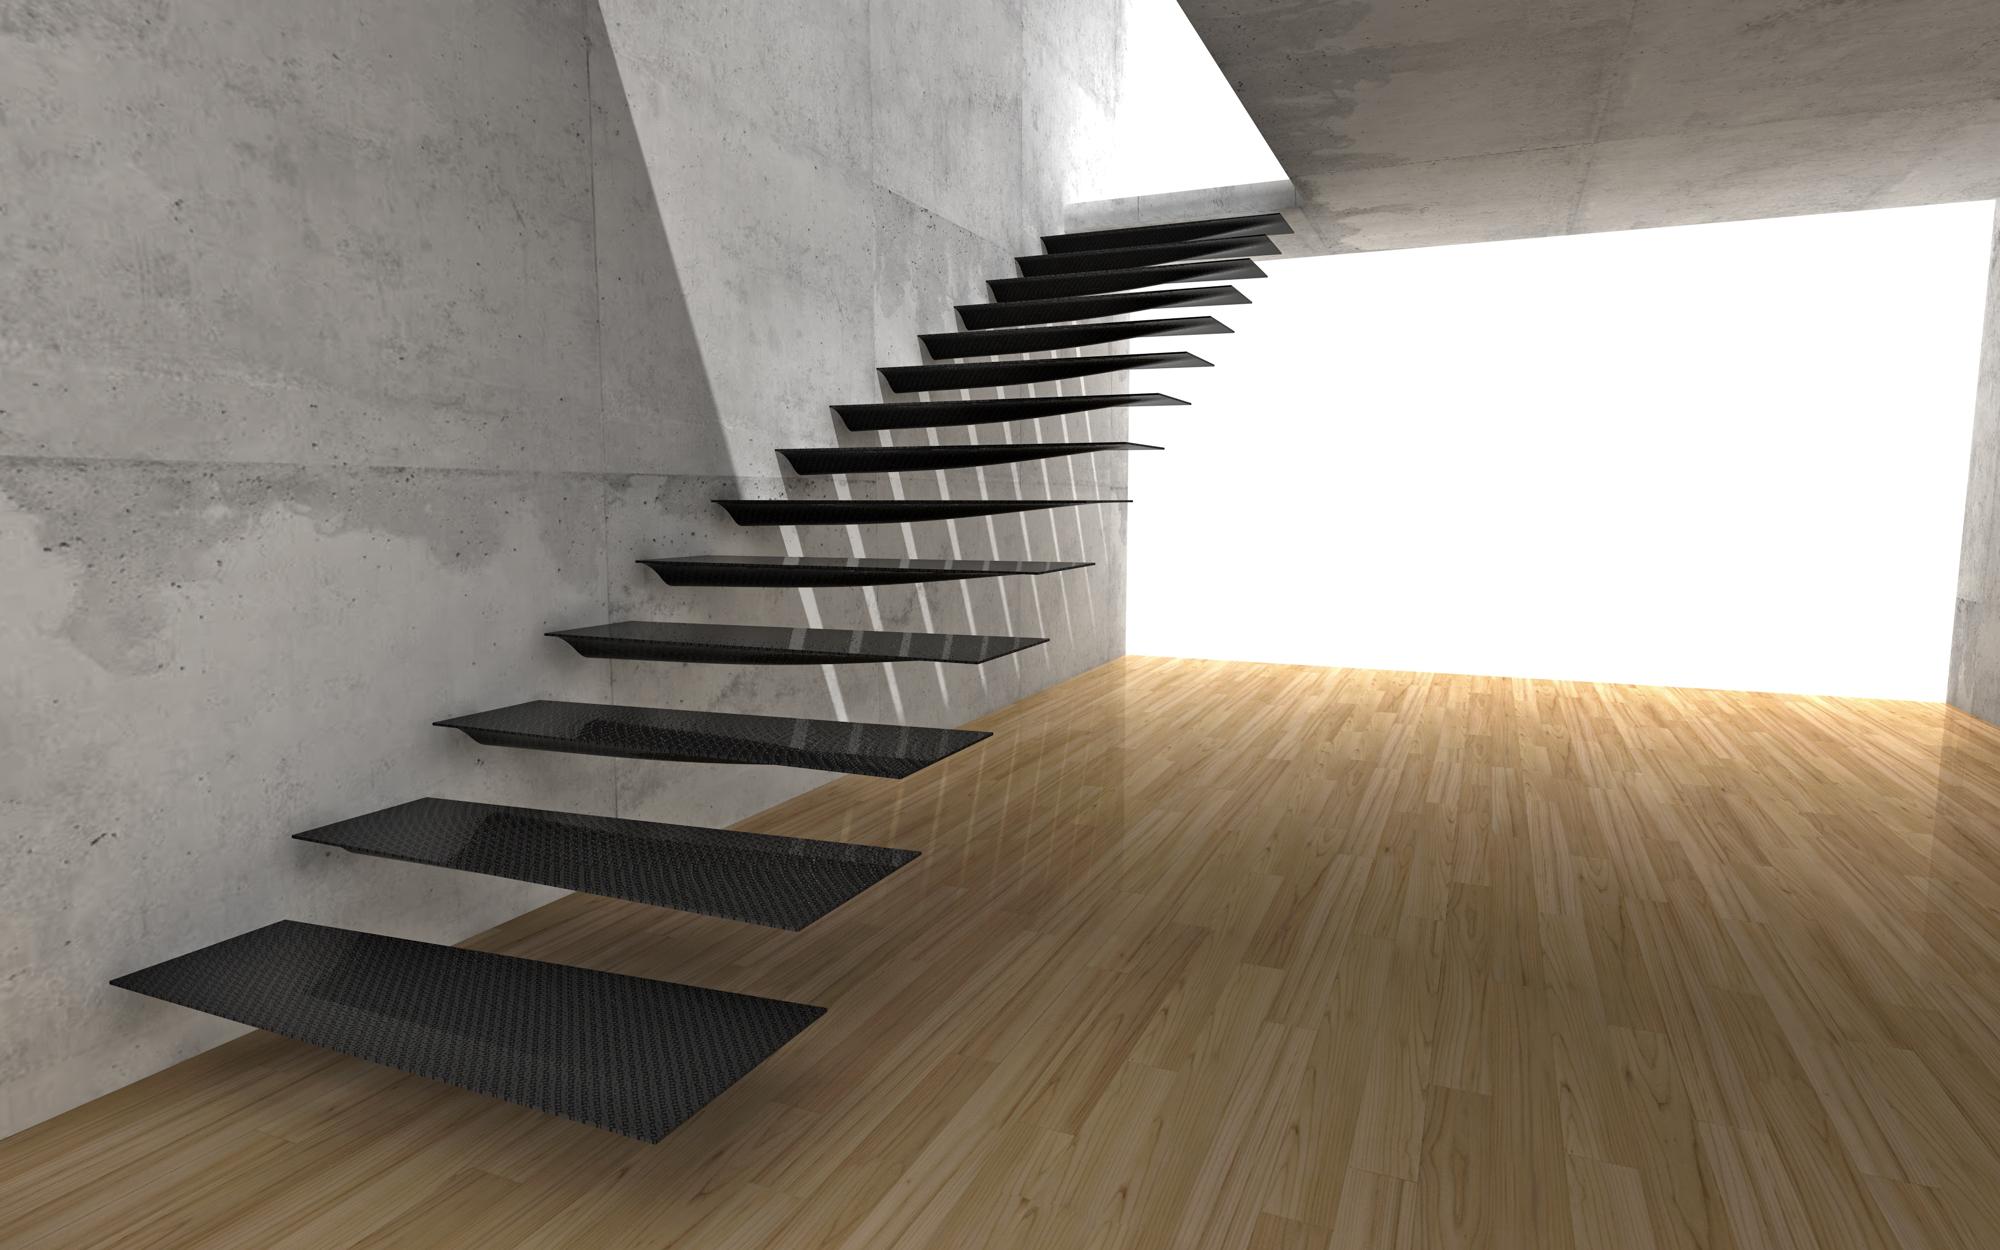 Nautilus Treppen treppen de präsentiert design treppen